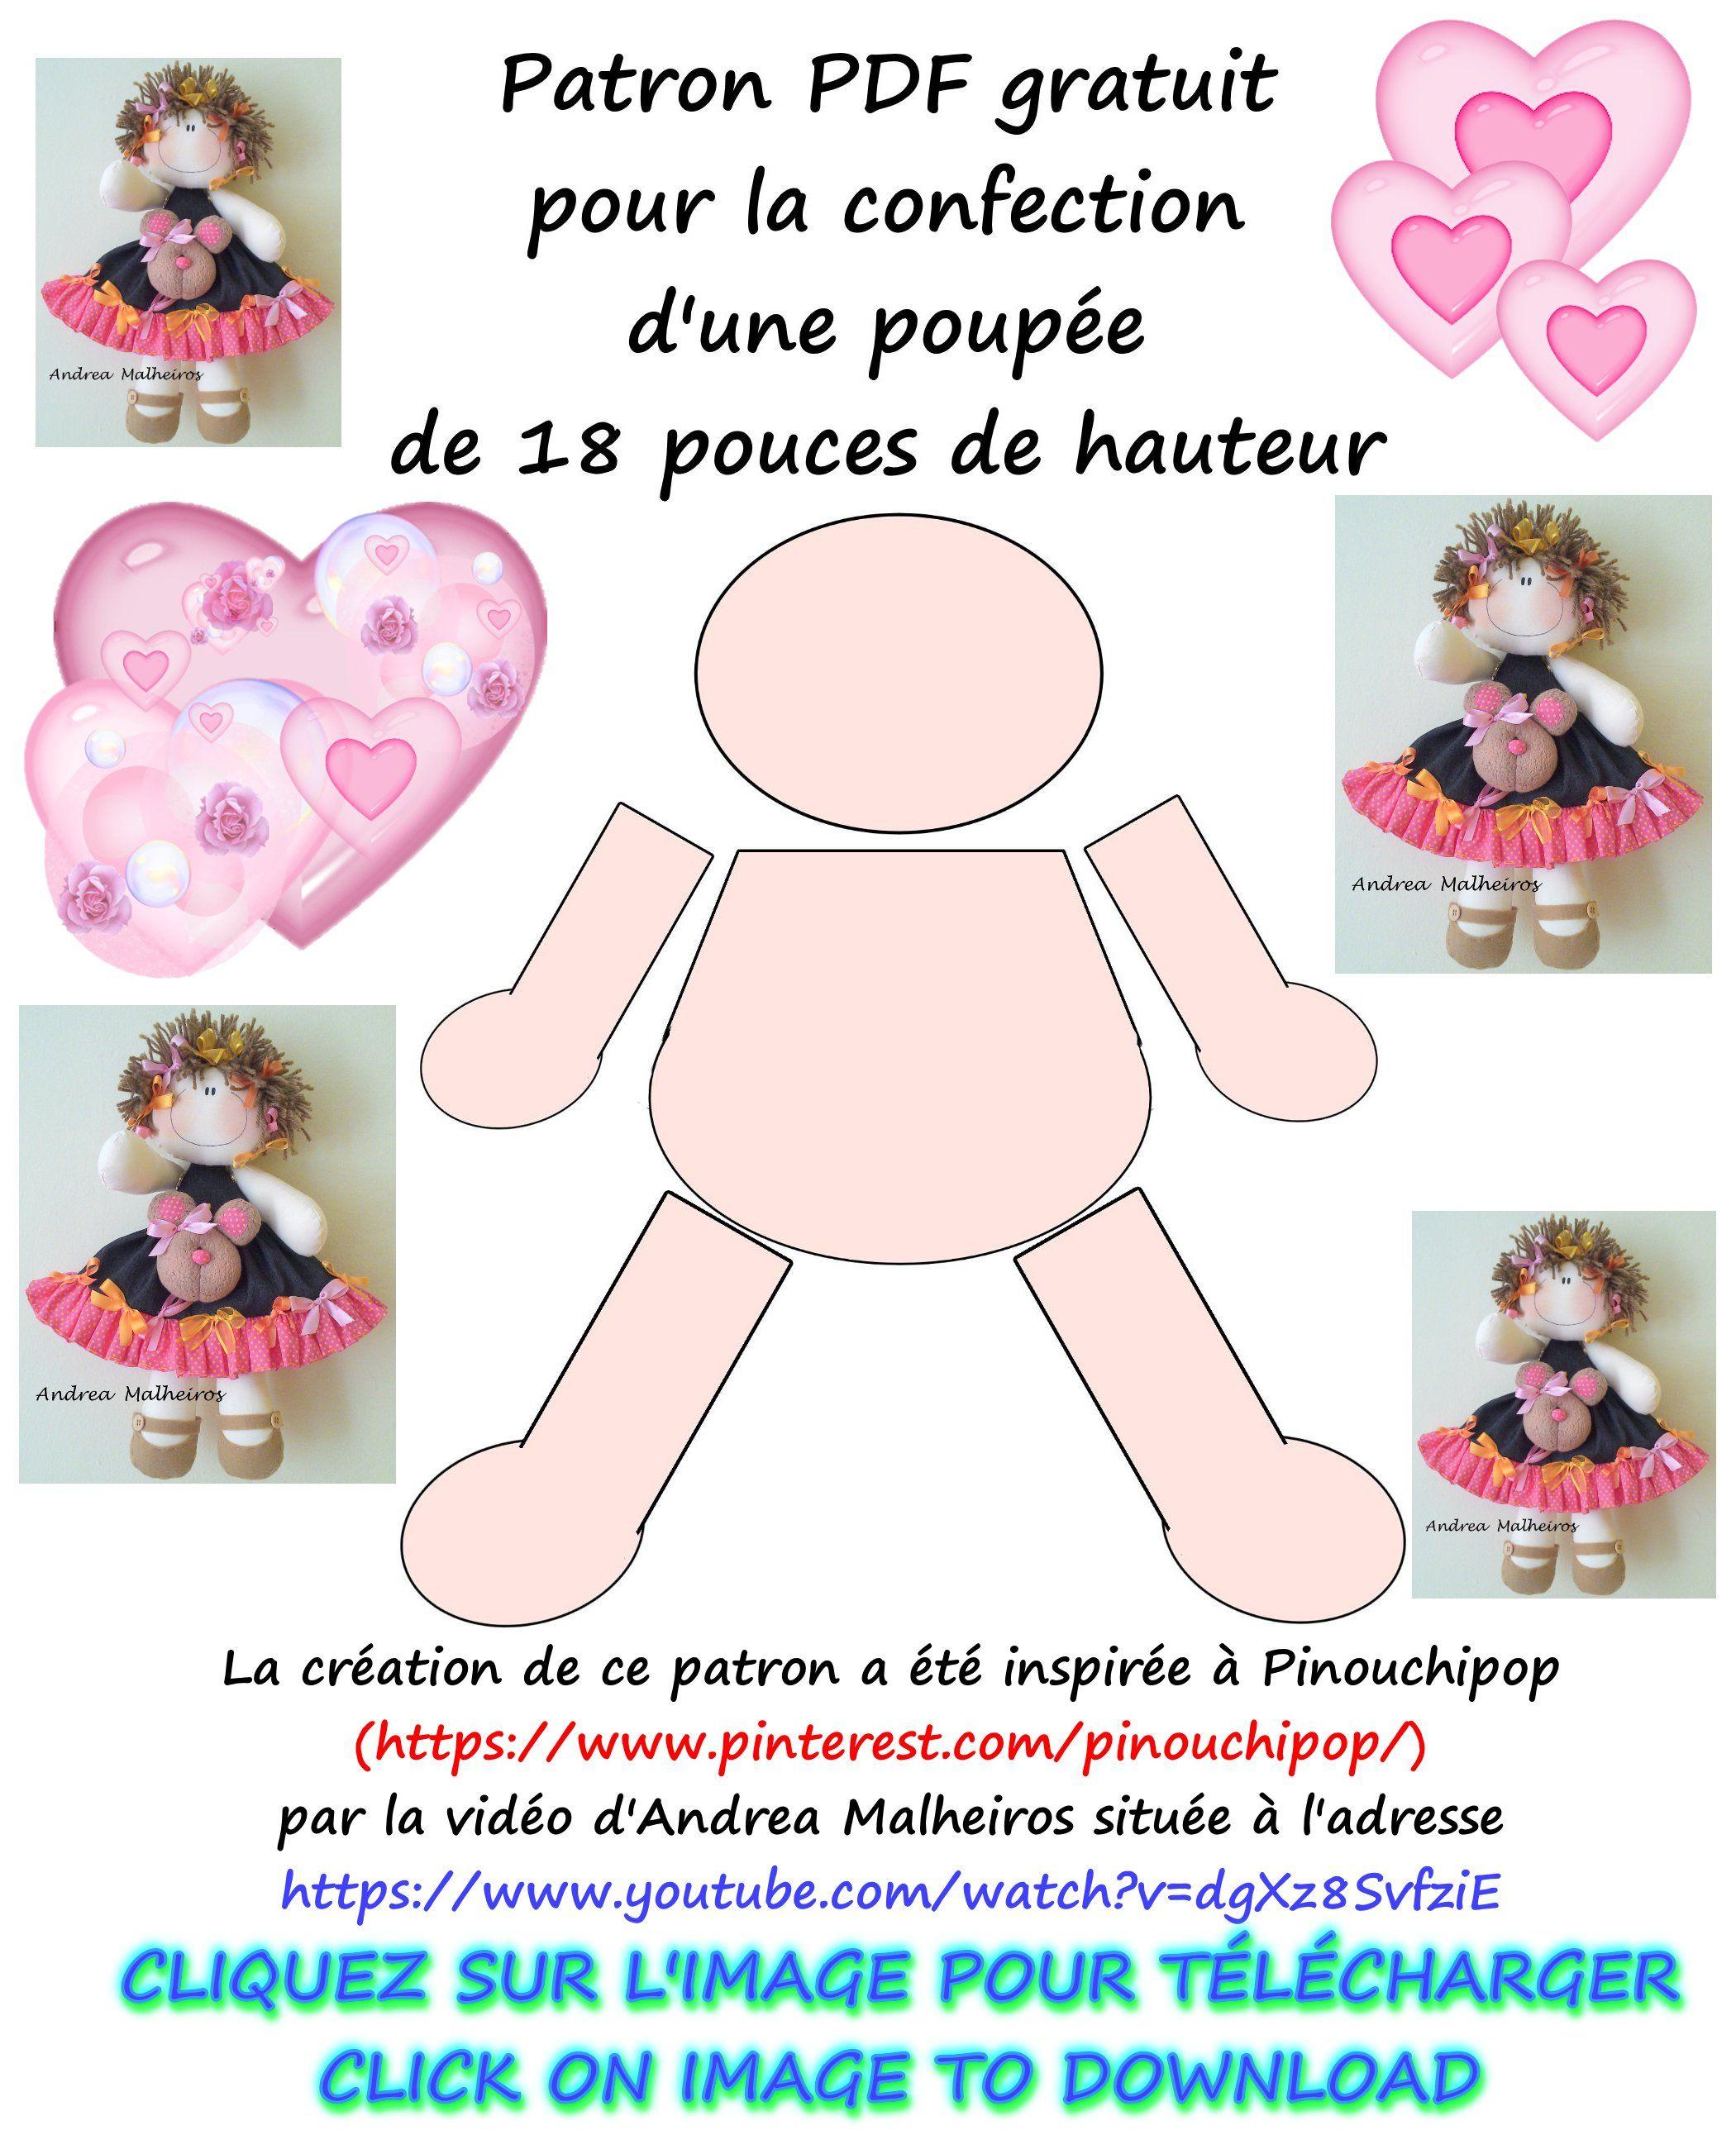 Pin de Clairee Antunez en muñecas de trapo | Pinterest | Amigurumi ...